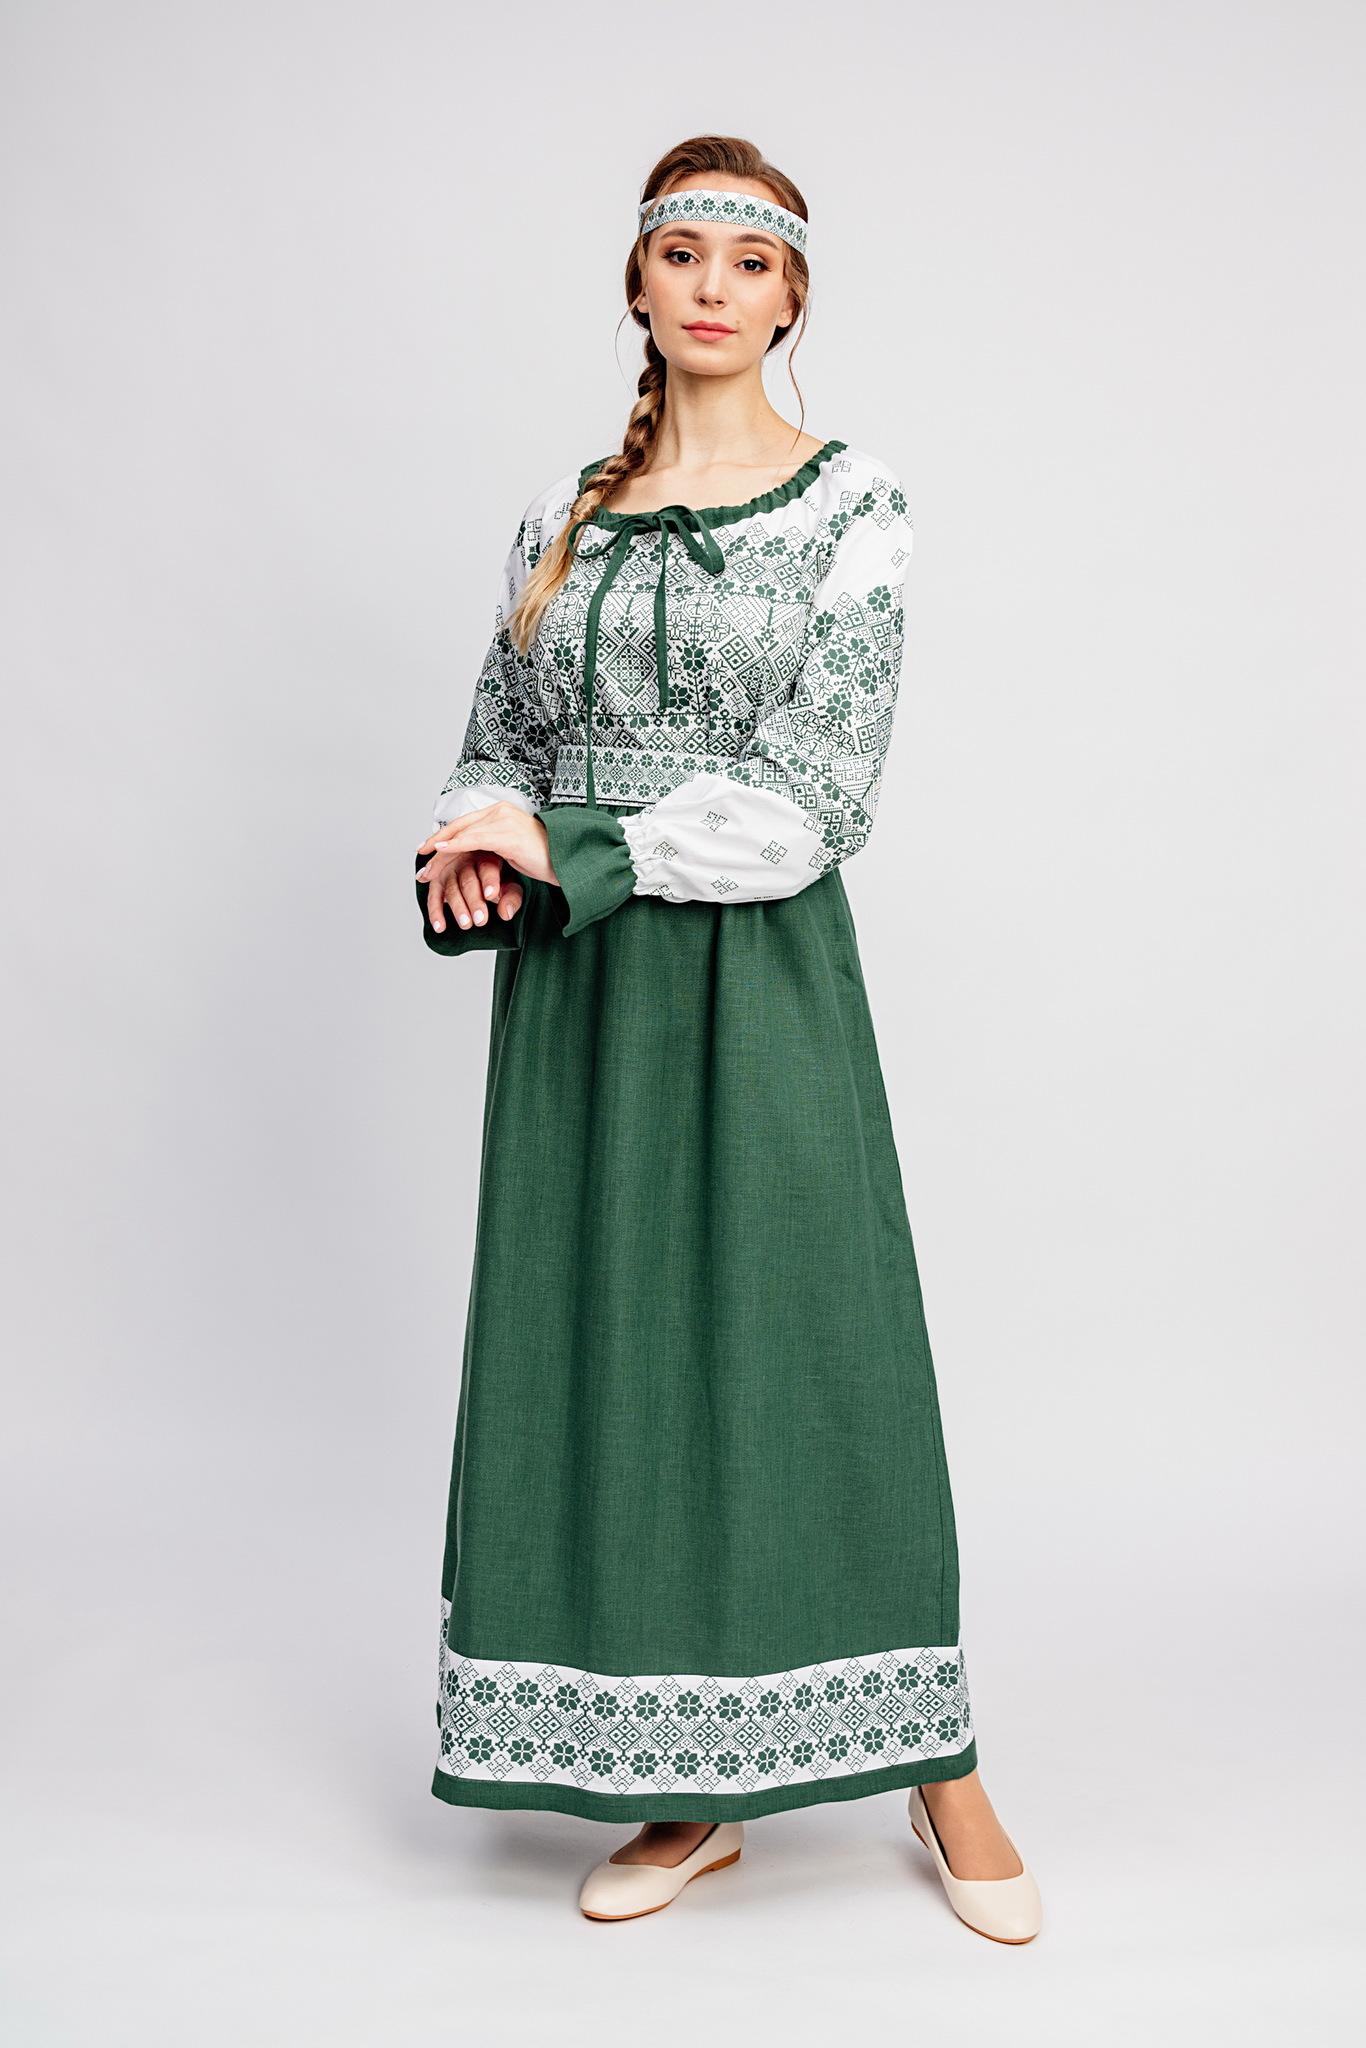 Народное платье Дары солнца